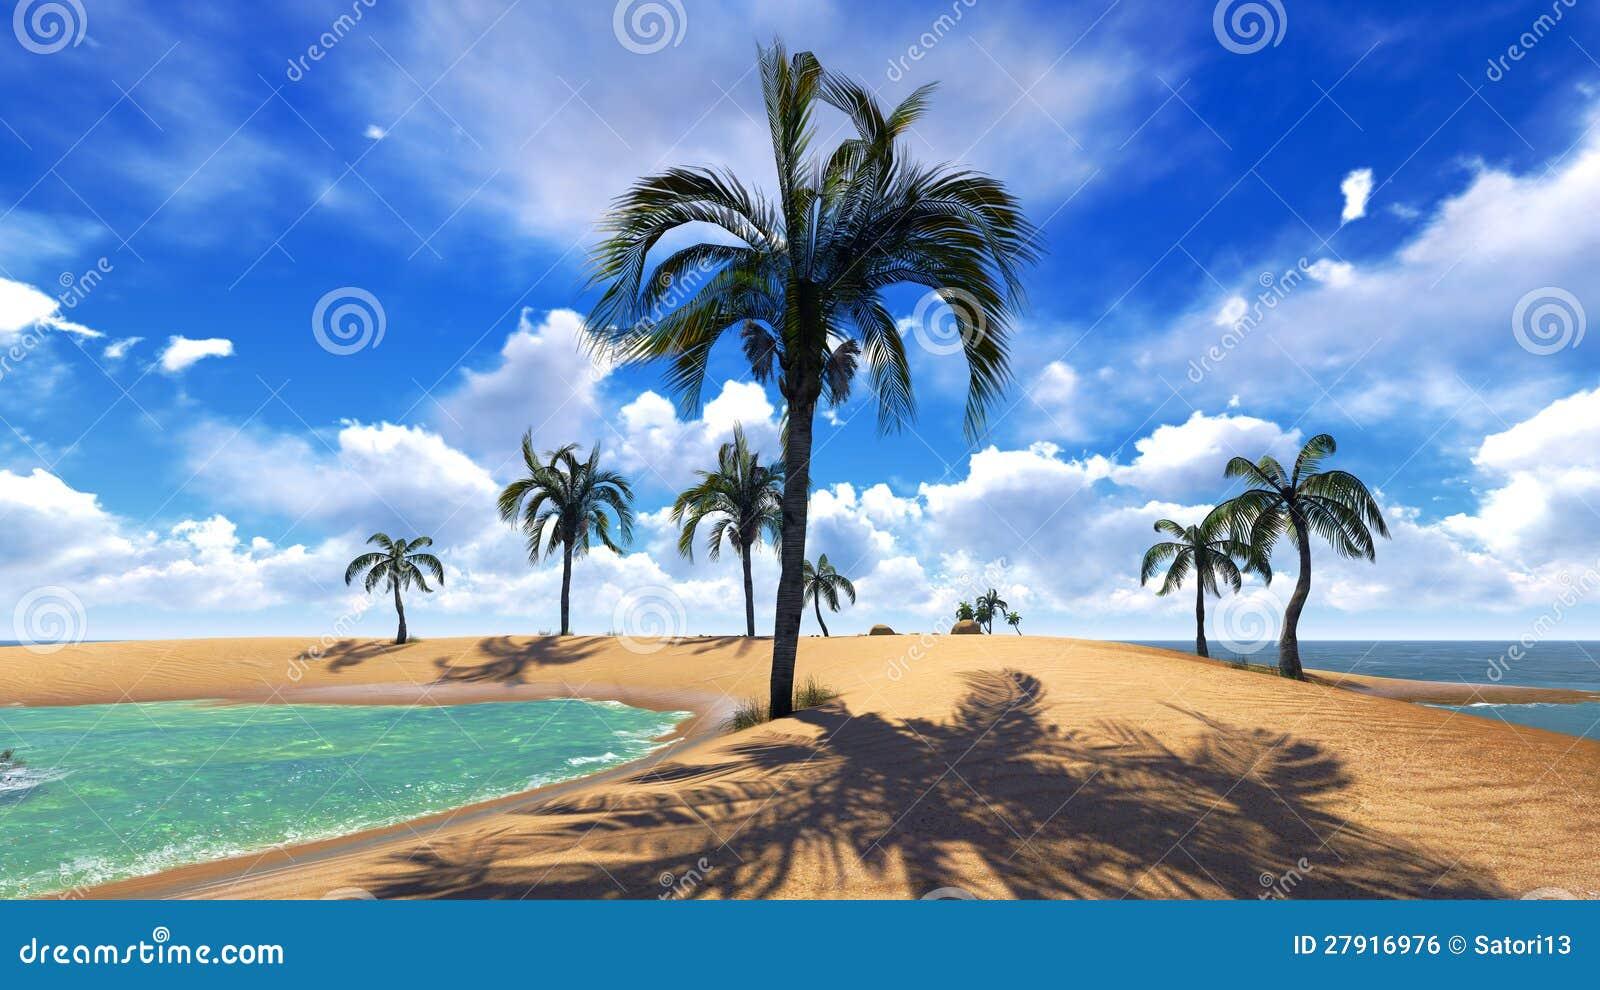 stock image of hawaiian - photo #41